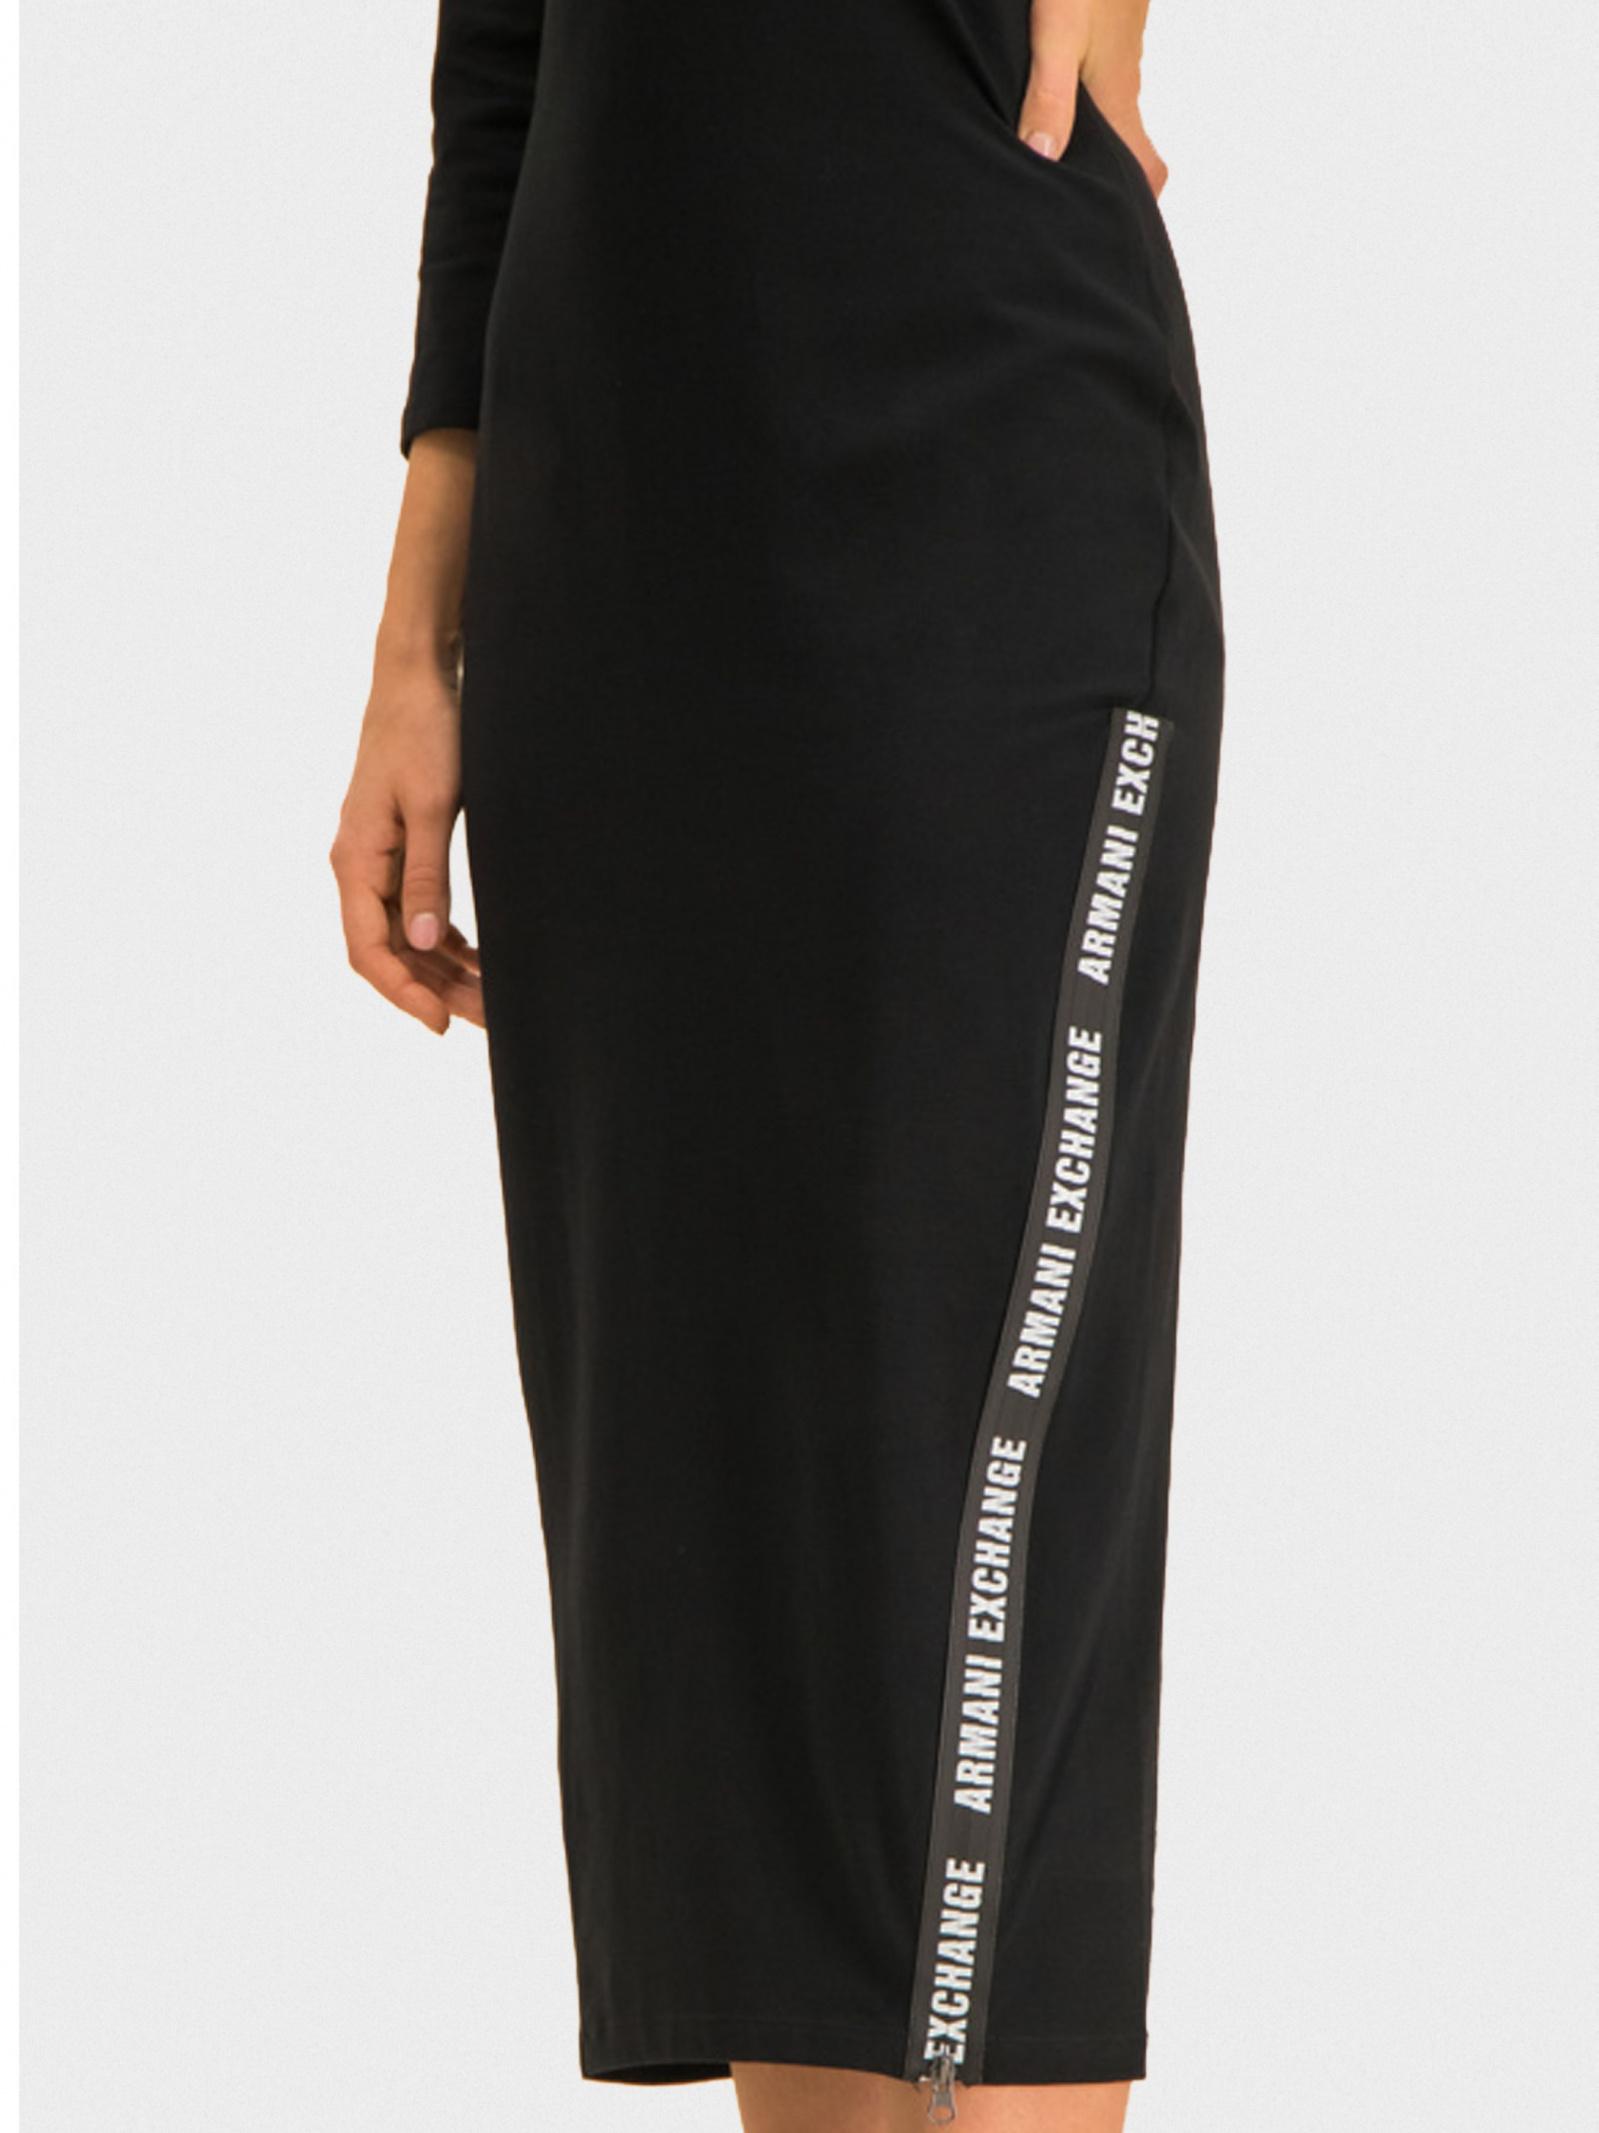 Платье женские Armani Exchange модель QZ2100 приобрести, 2017